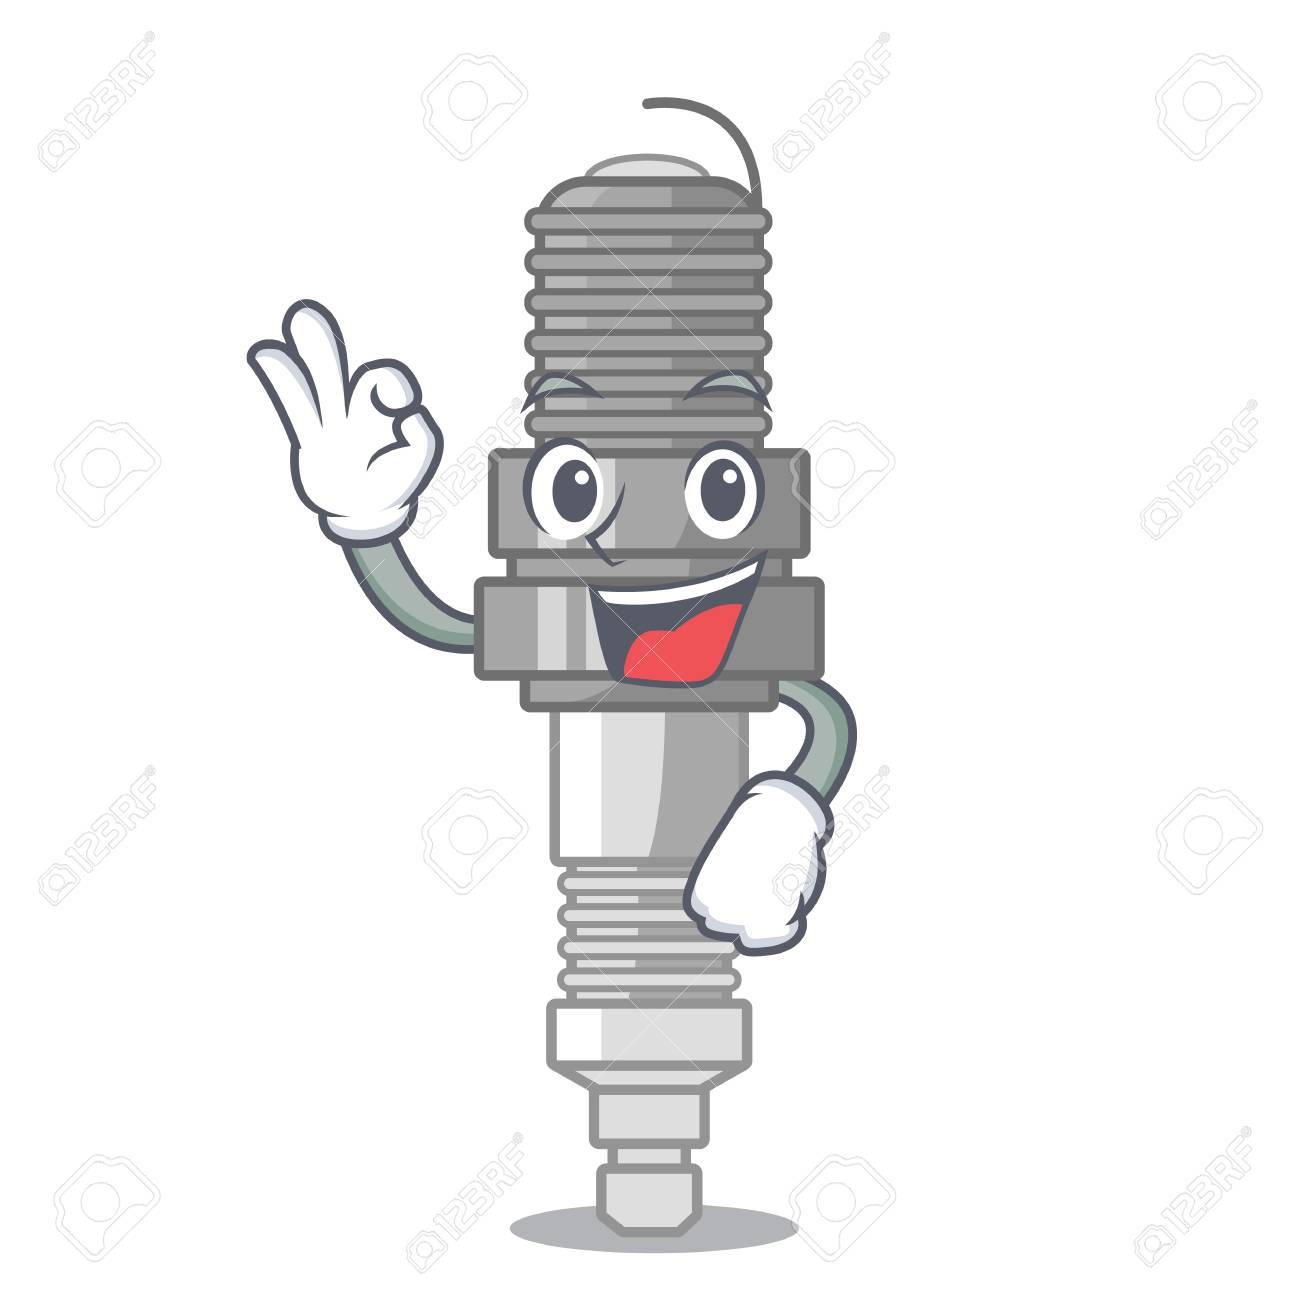 Okay Spark Plug In A Cartoon Box Vector Illustration Royalty Free Cliparts Vectors And Stock Illustration Image 117896853